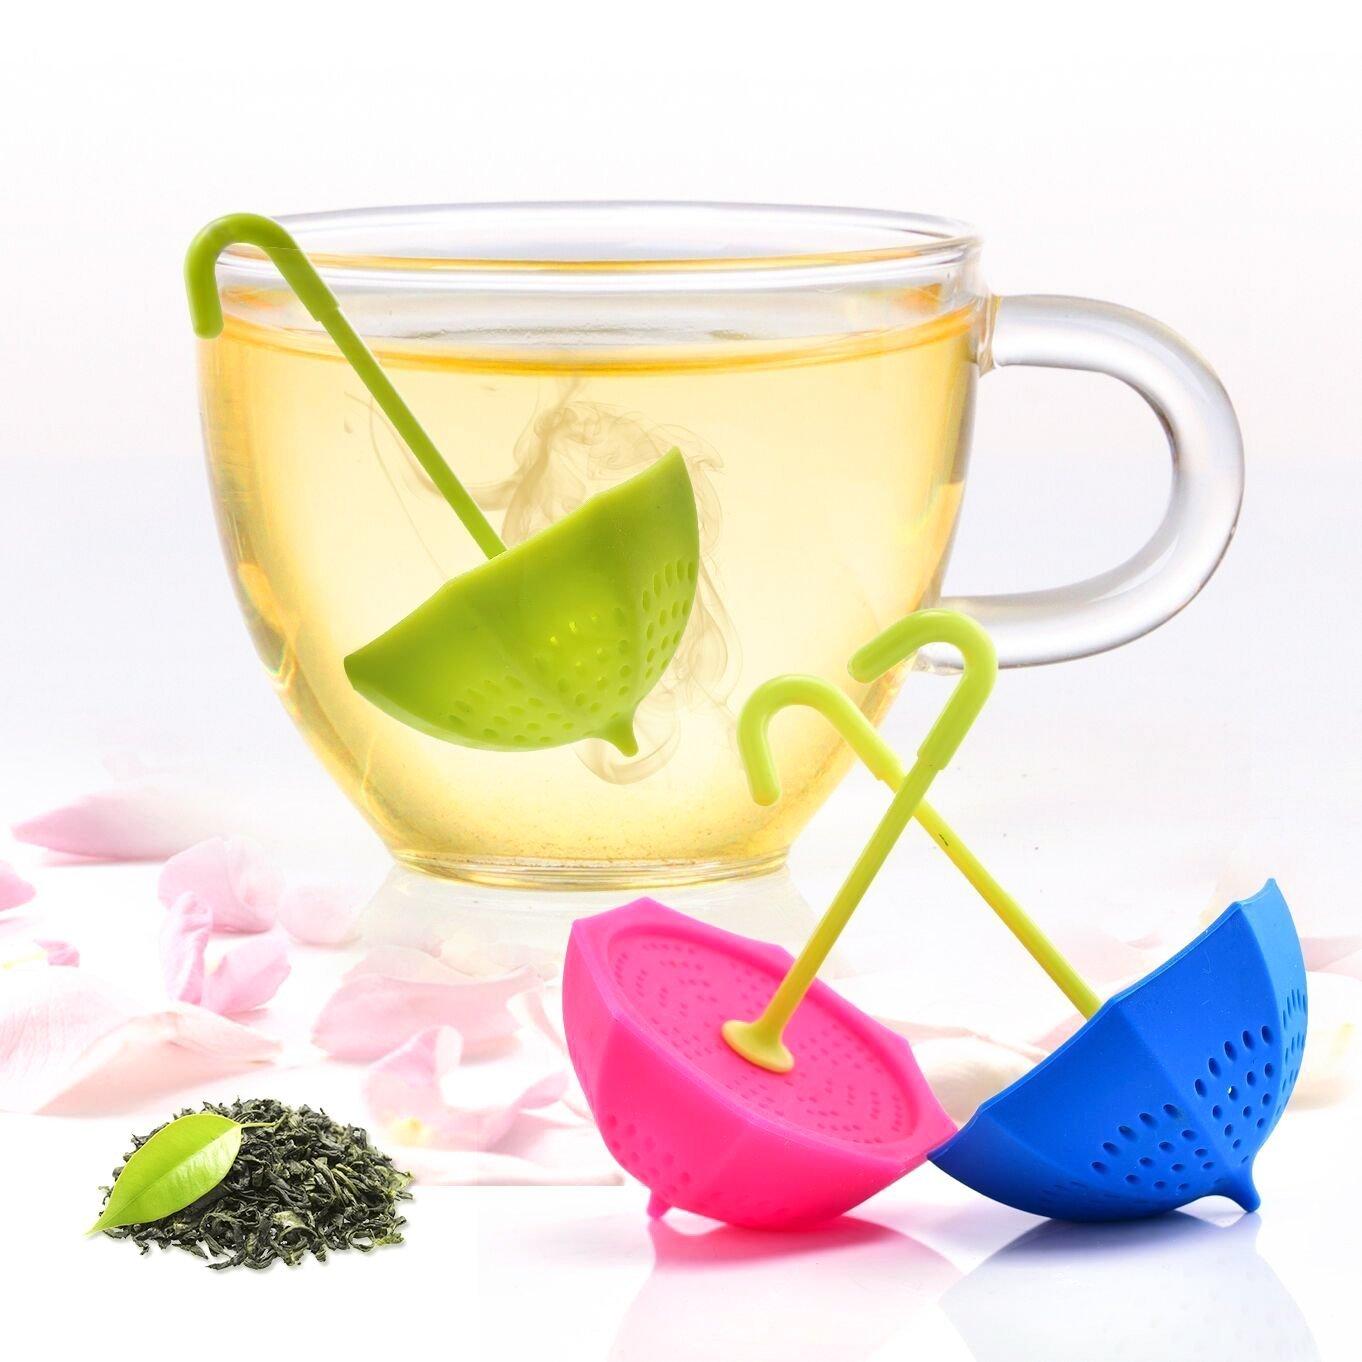 Rainy day tea time. - $